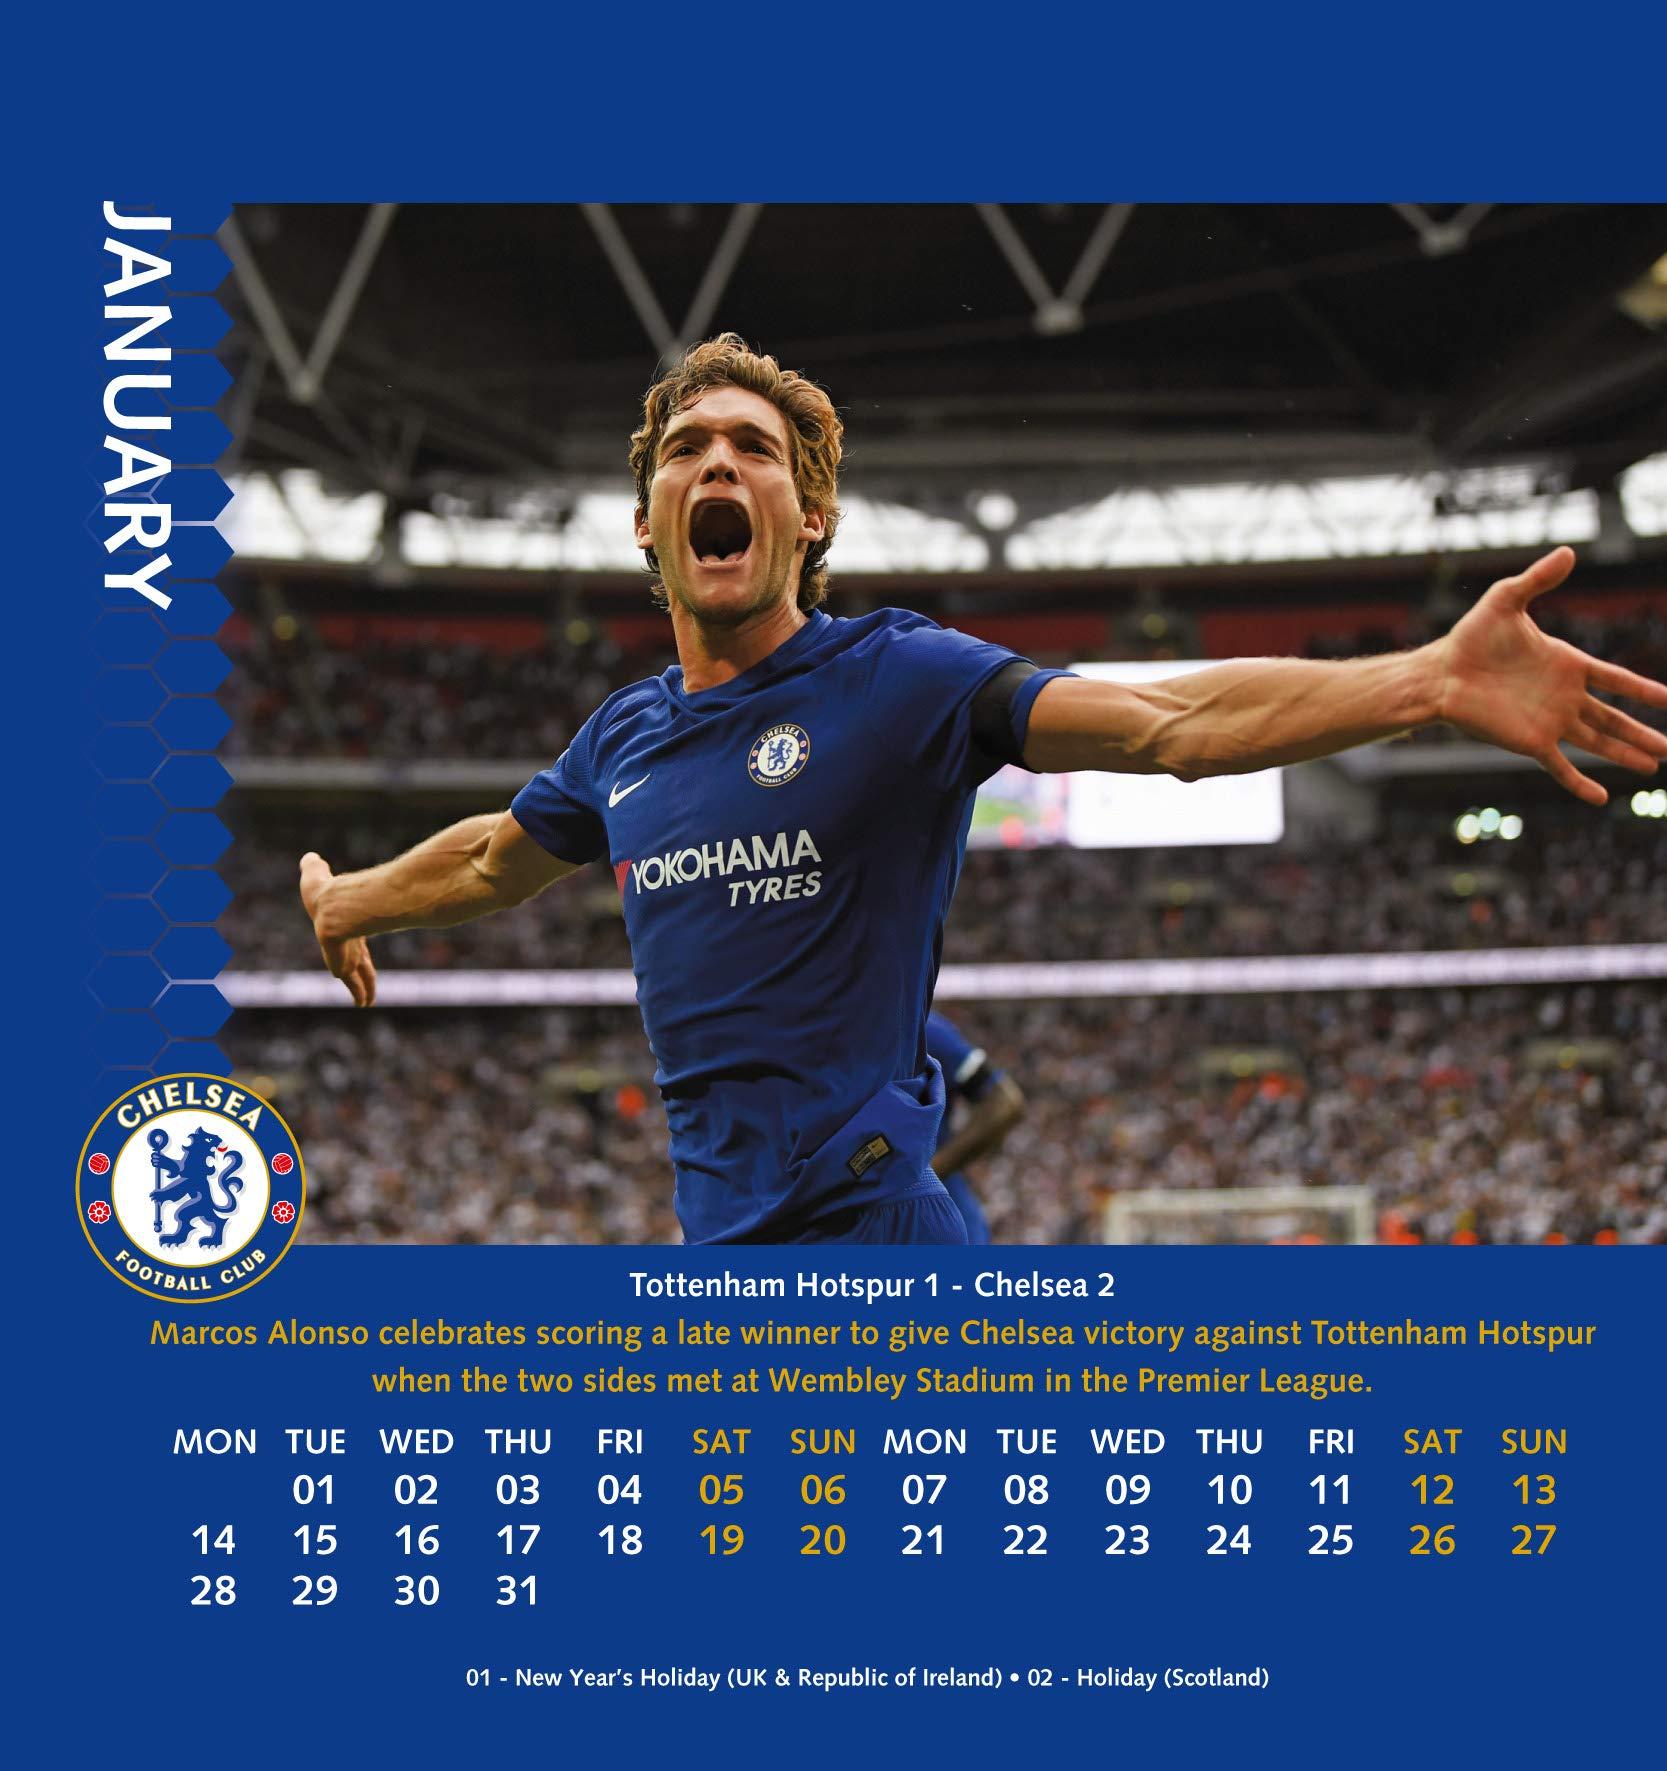 e0d67dc63408 Chelsea Desk Easel Official 2019 Calendar - Desk Easel Format:  Amazon.co.uk: Chelsea: Books